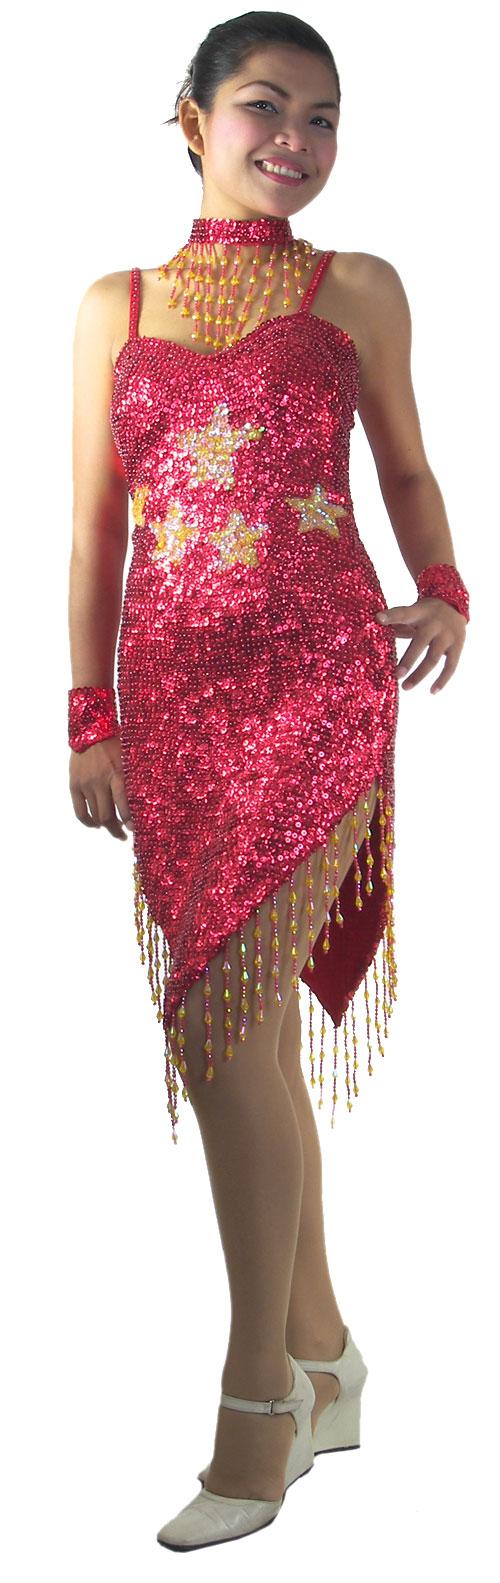 Sequin-Dresses/RM526-sequin-bead-fringe-showgirl-dance-leotard.jpg